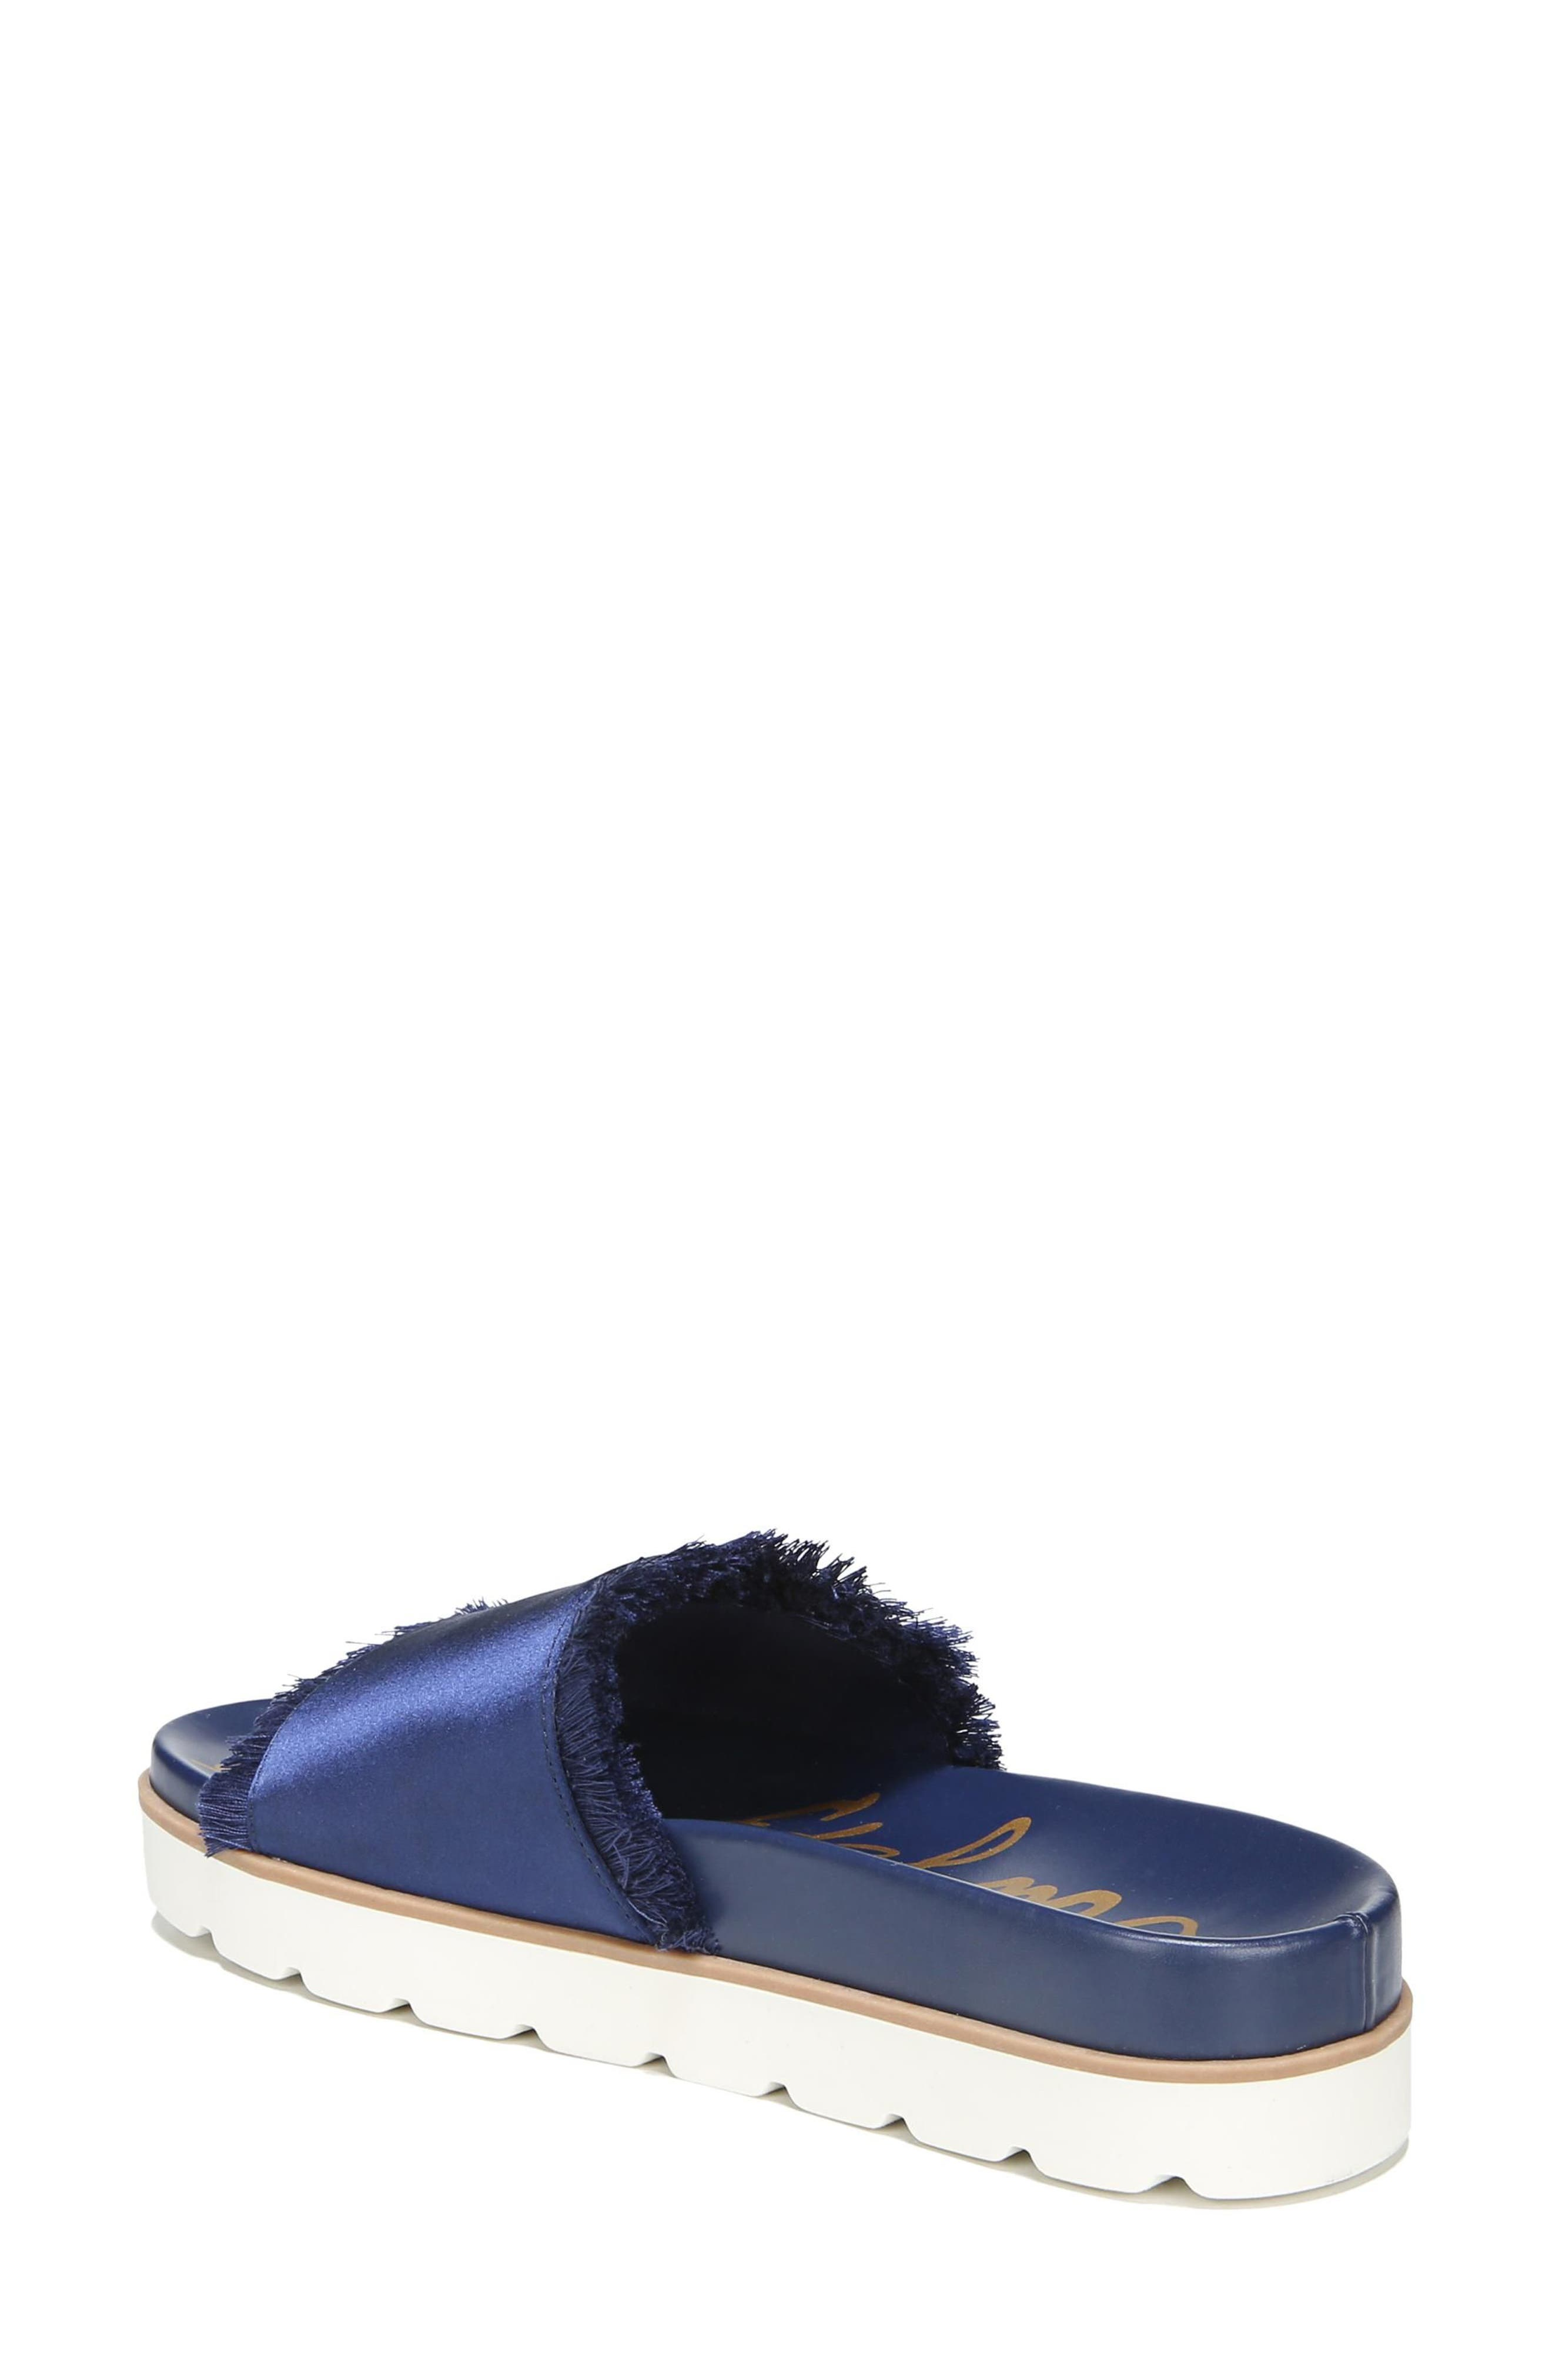 Mares Slide Sandal,                             Alternate thumbnail 2, color,                             Poseidon Blue Satin